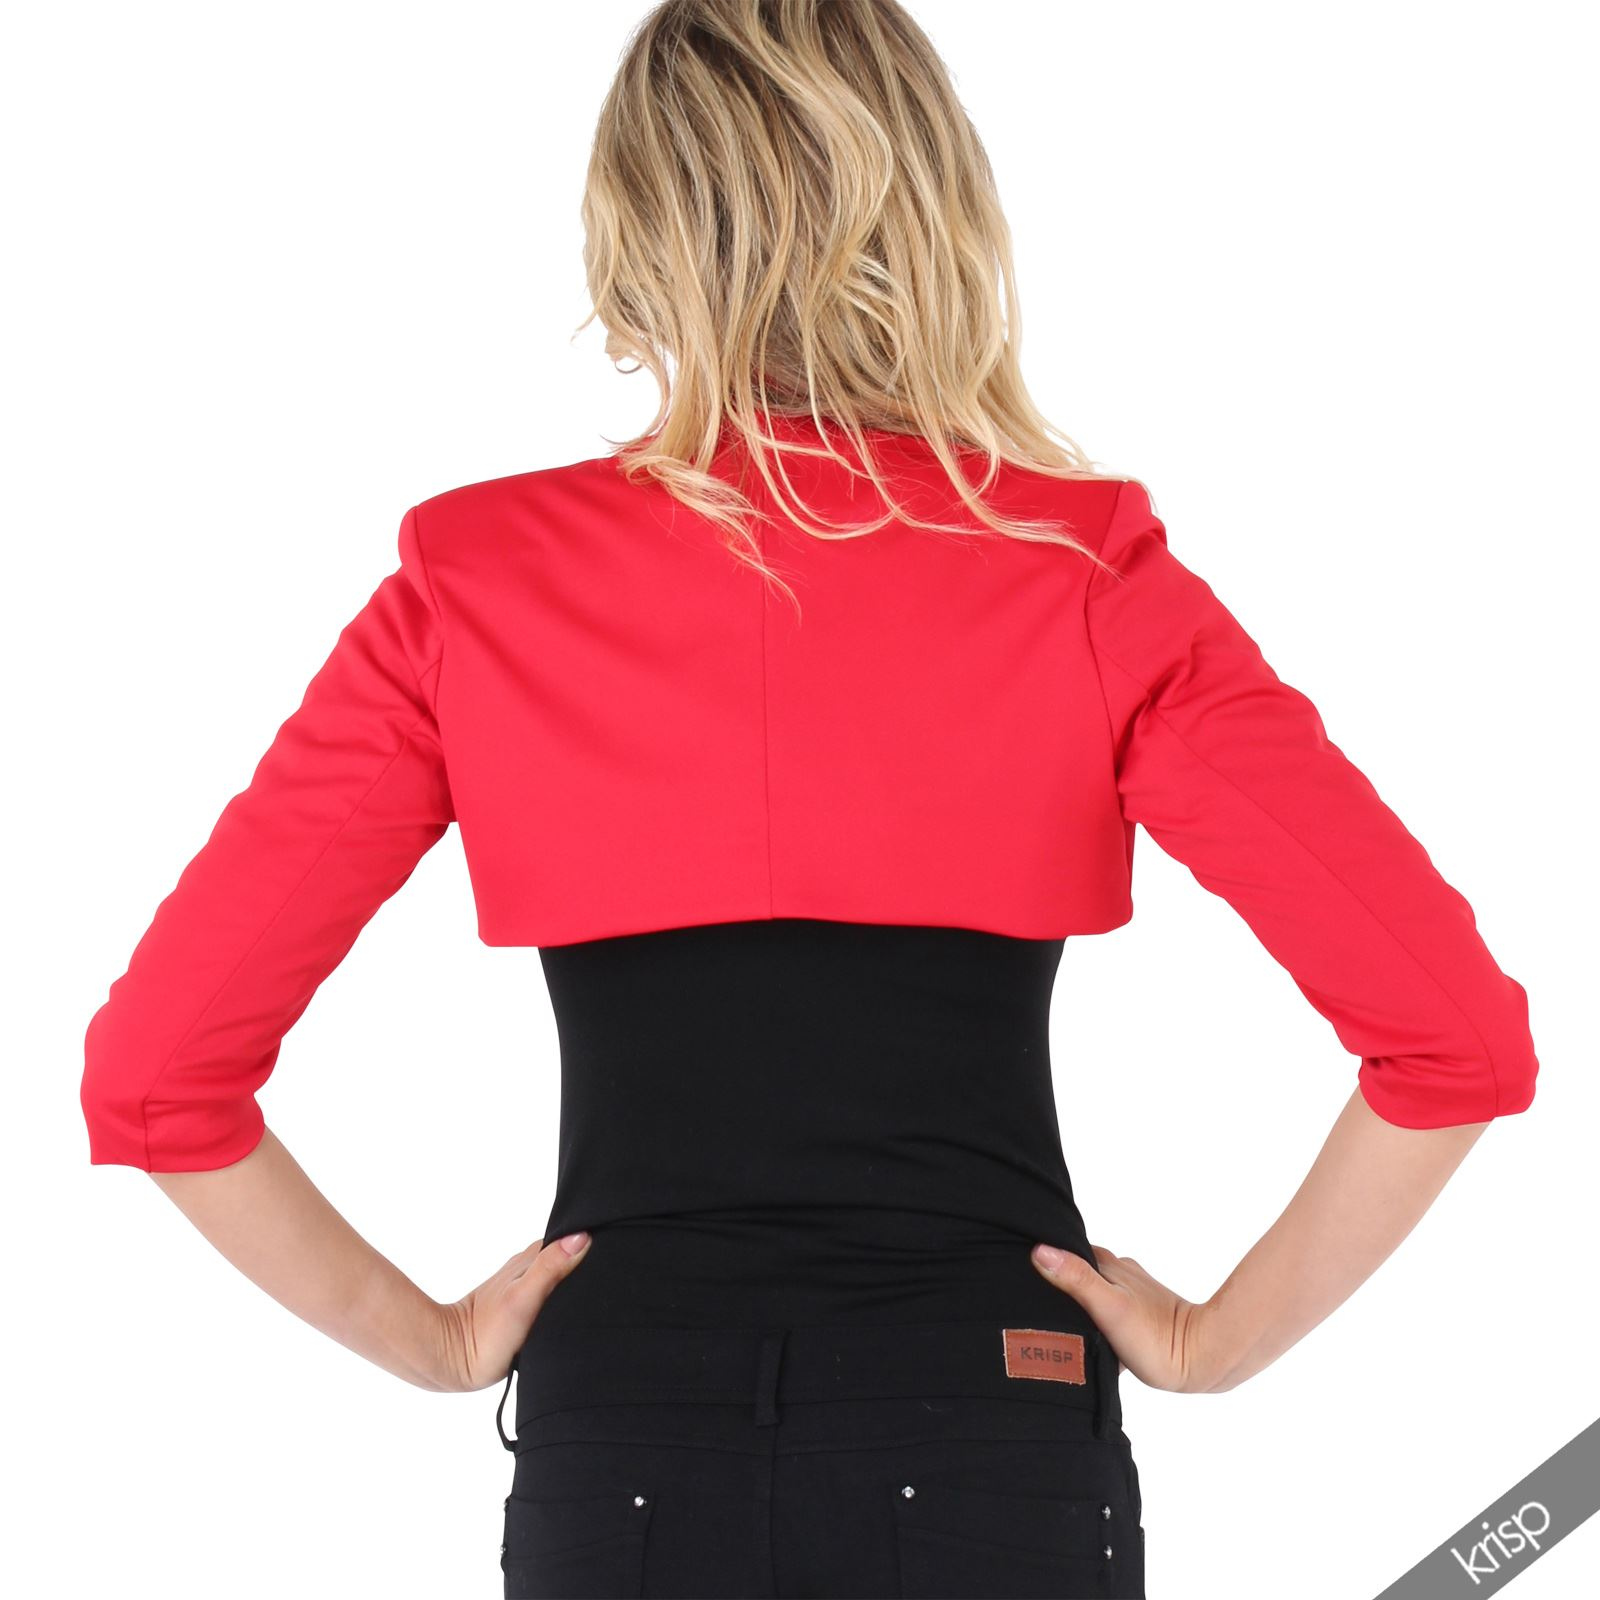 Womens-Tailored-Bolero-Shrug-Cropped-Top-Short-Sleeve-Party-Blazer-Jacket-Coat thumbnail 18